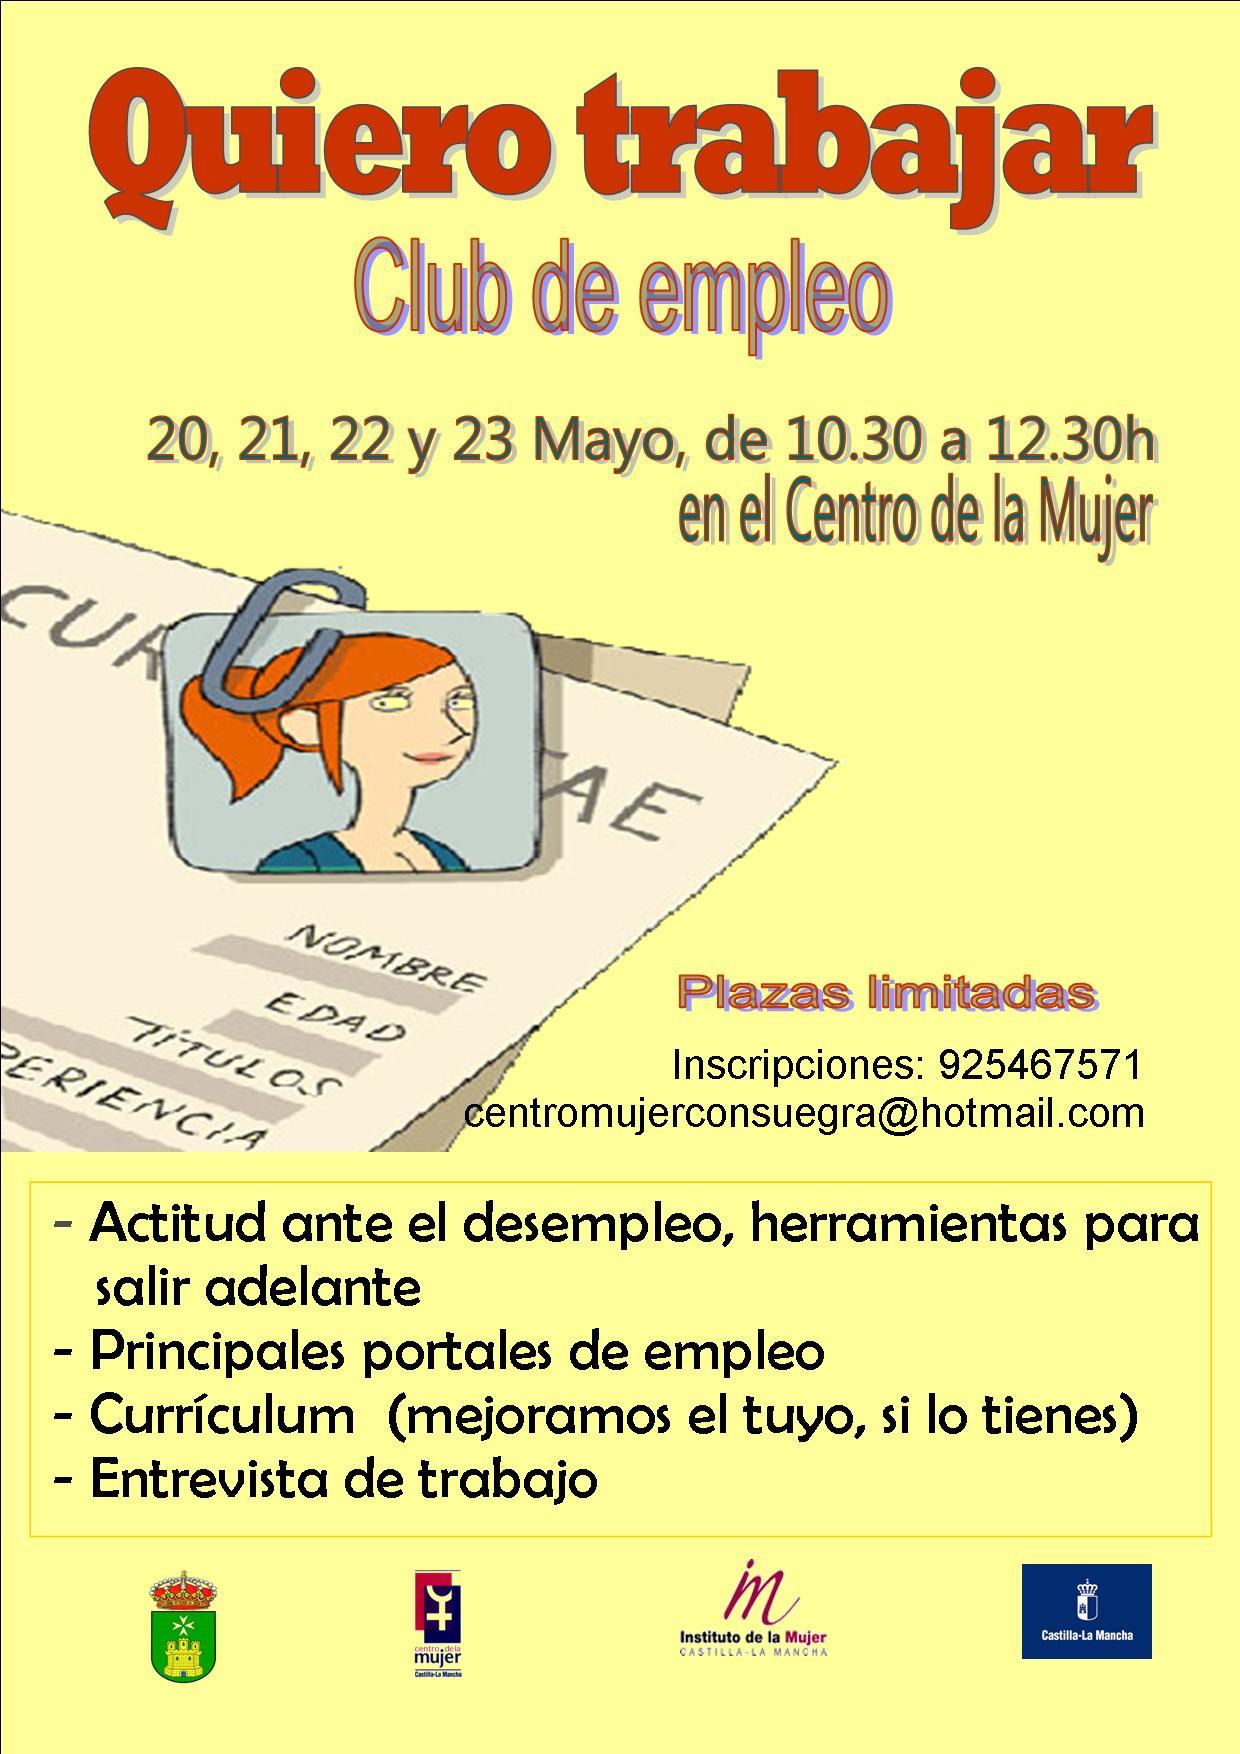 club-empleo-mayo2014-cmujer.jpg - 236.28 KB